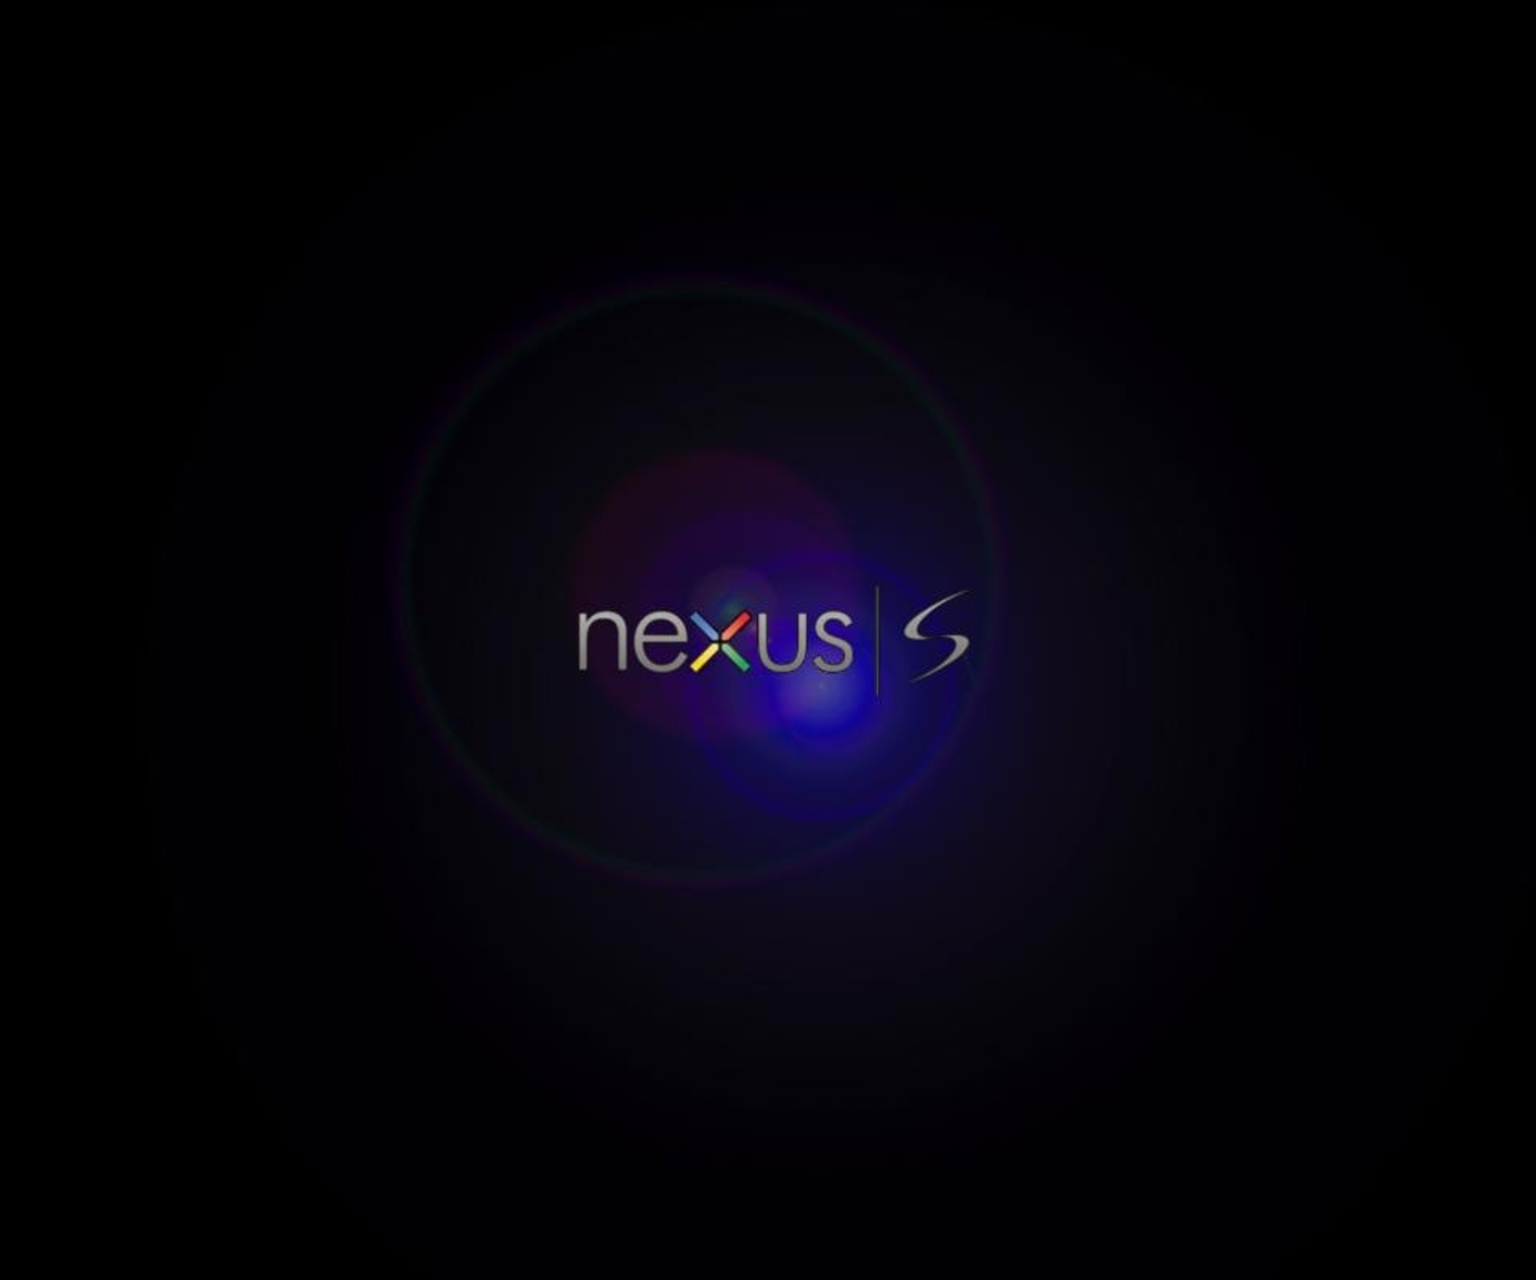 nexus desktop wallpaper background wallpapersafari